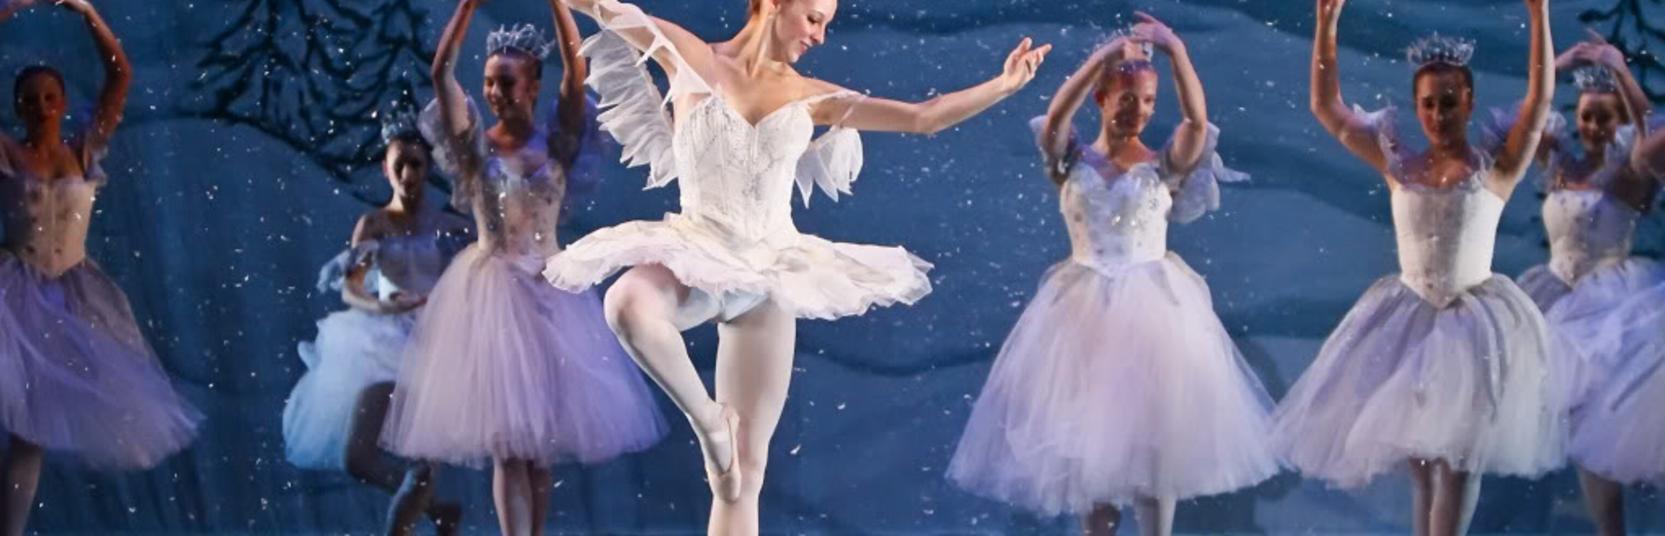 The Fort Wayne Ballet Presents The Nutcracker